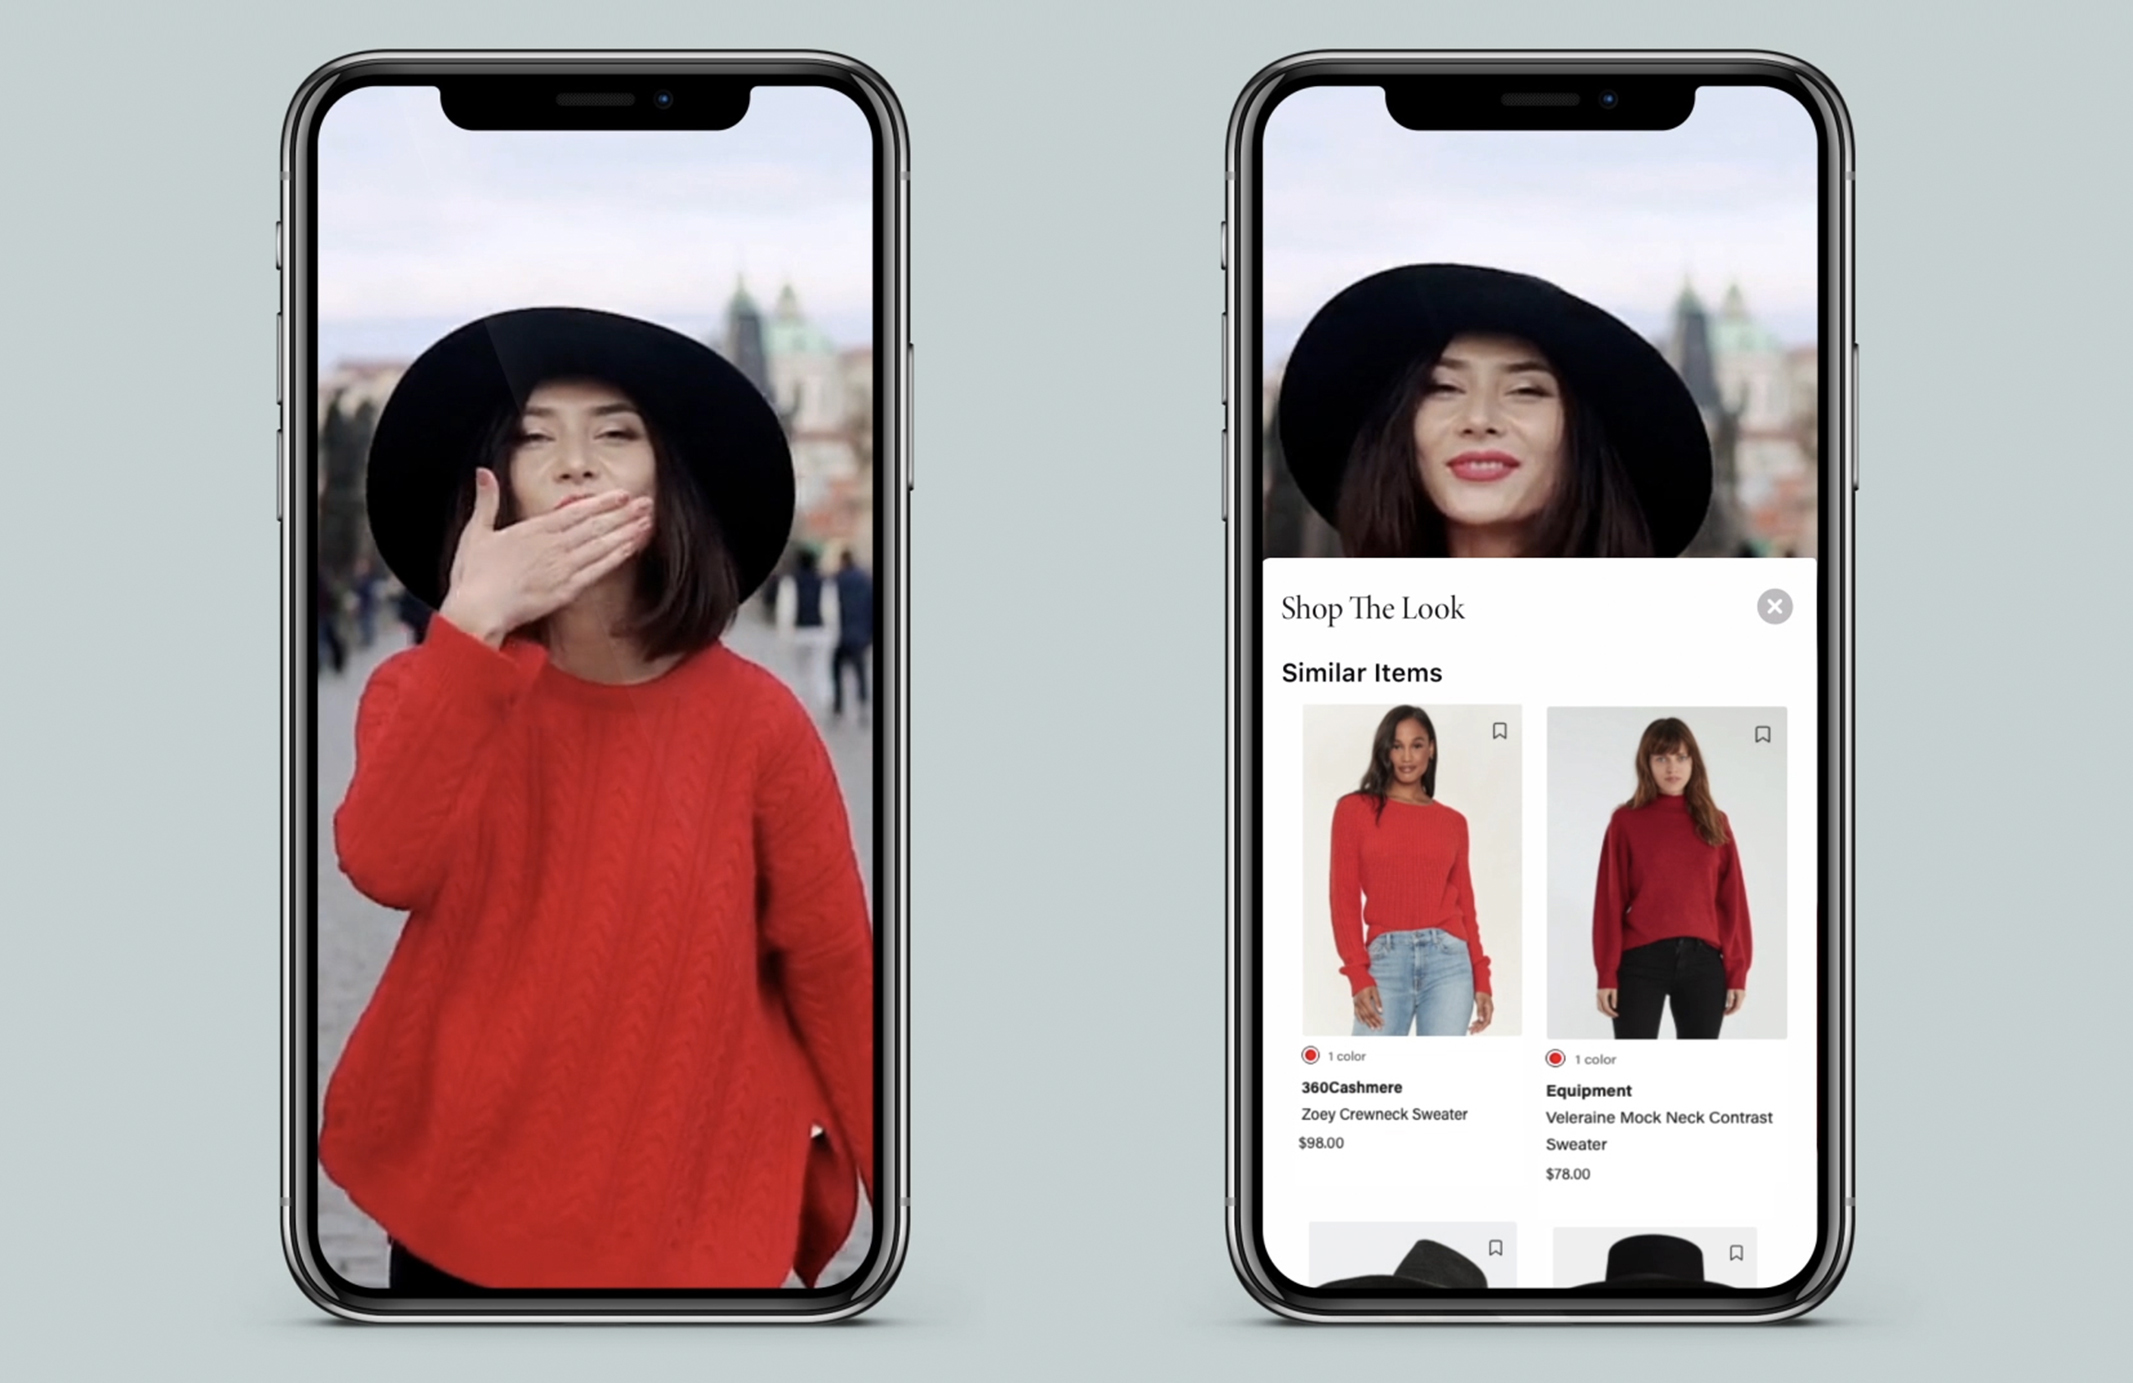 Verishop Explorer shoppable social media content